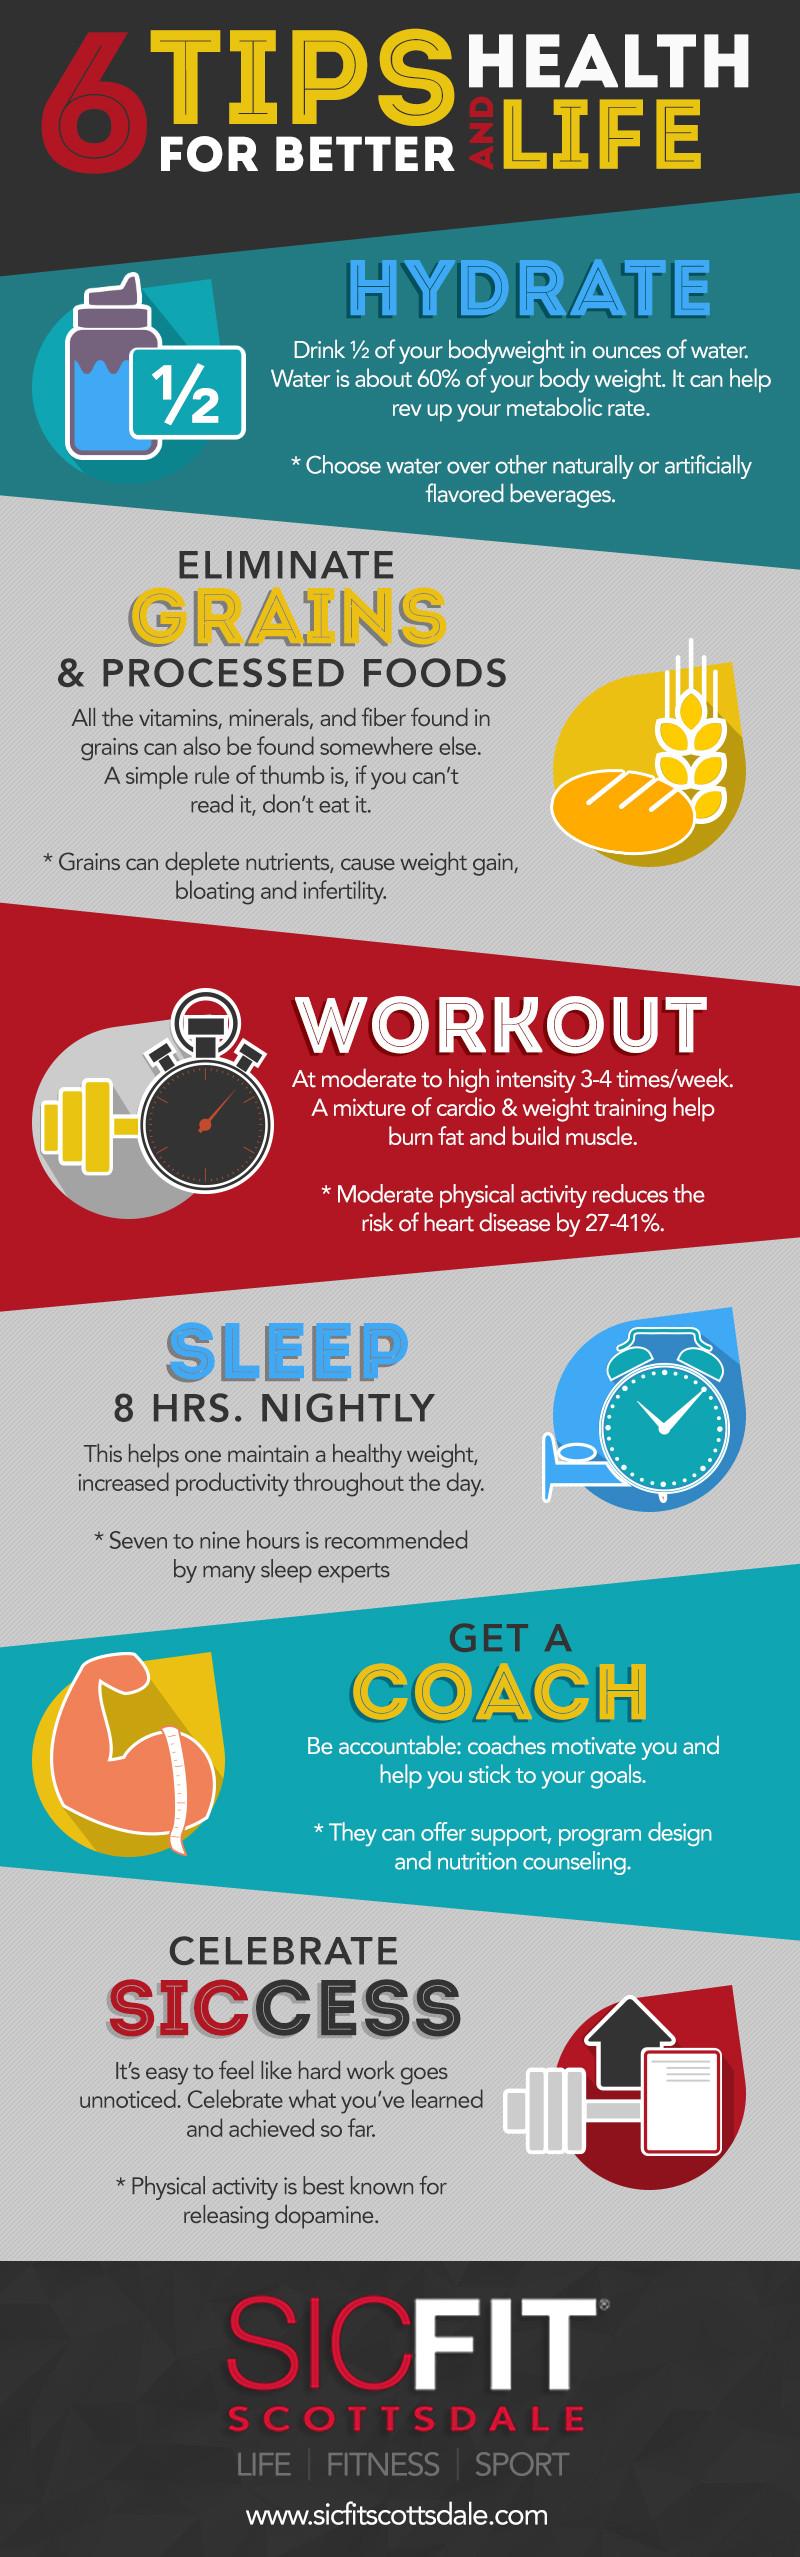 153084? w=800 - 5 Wellness Tips for Women